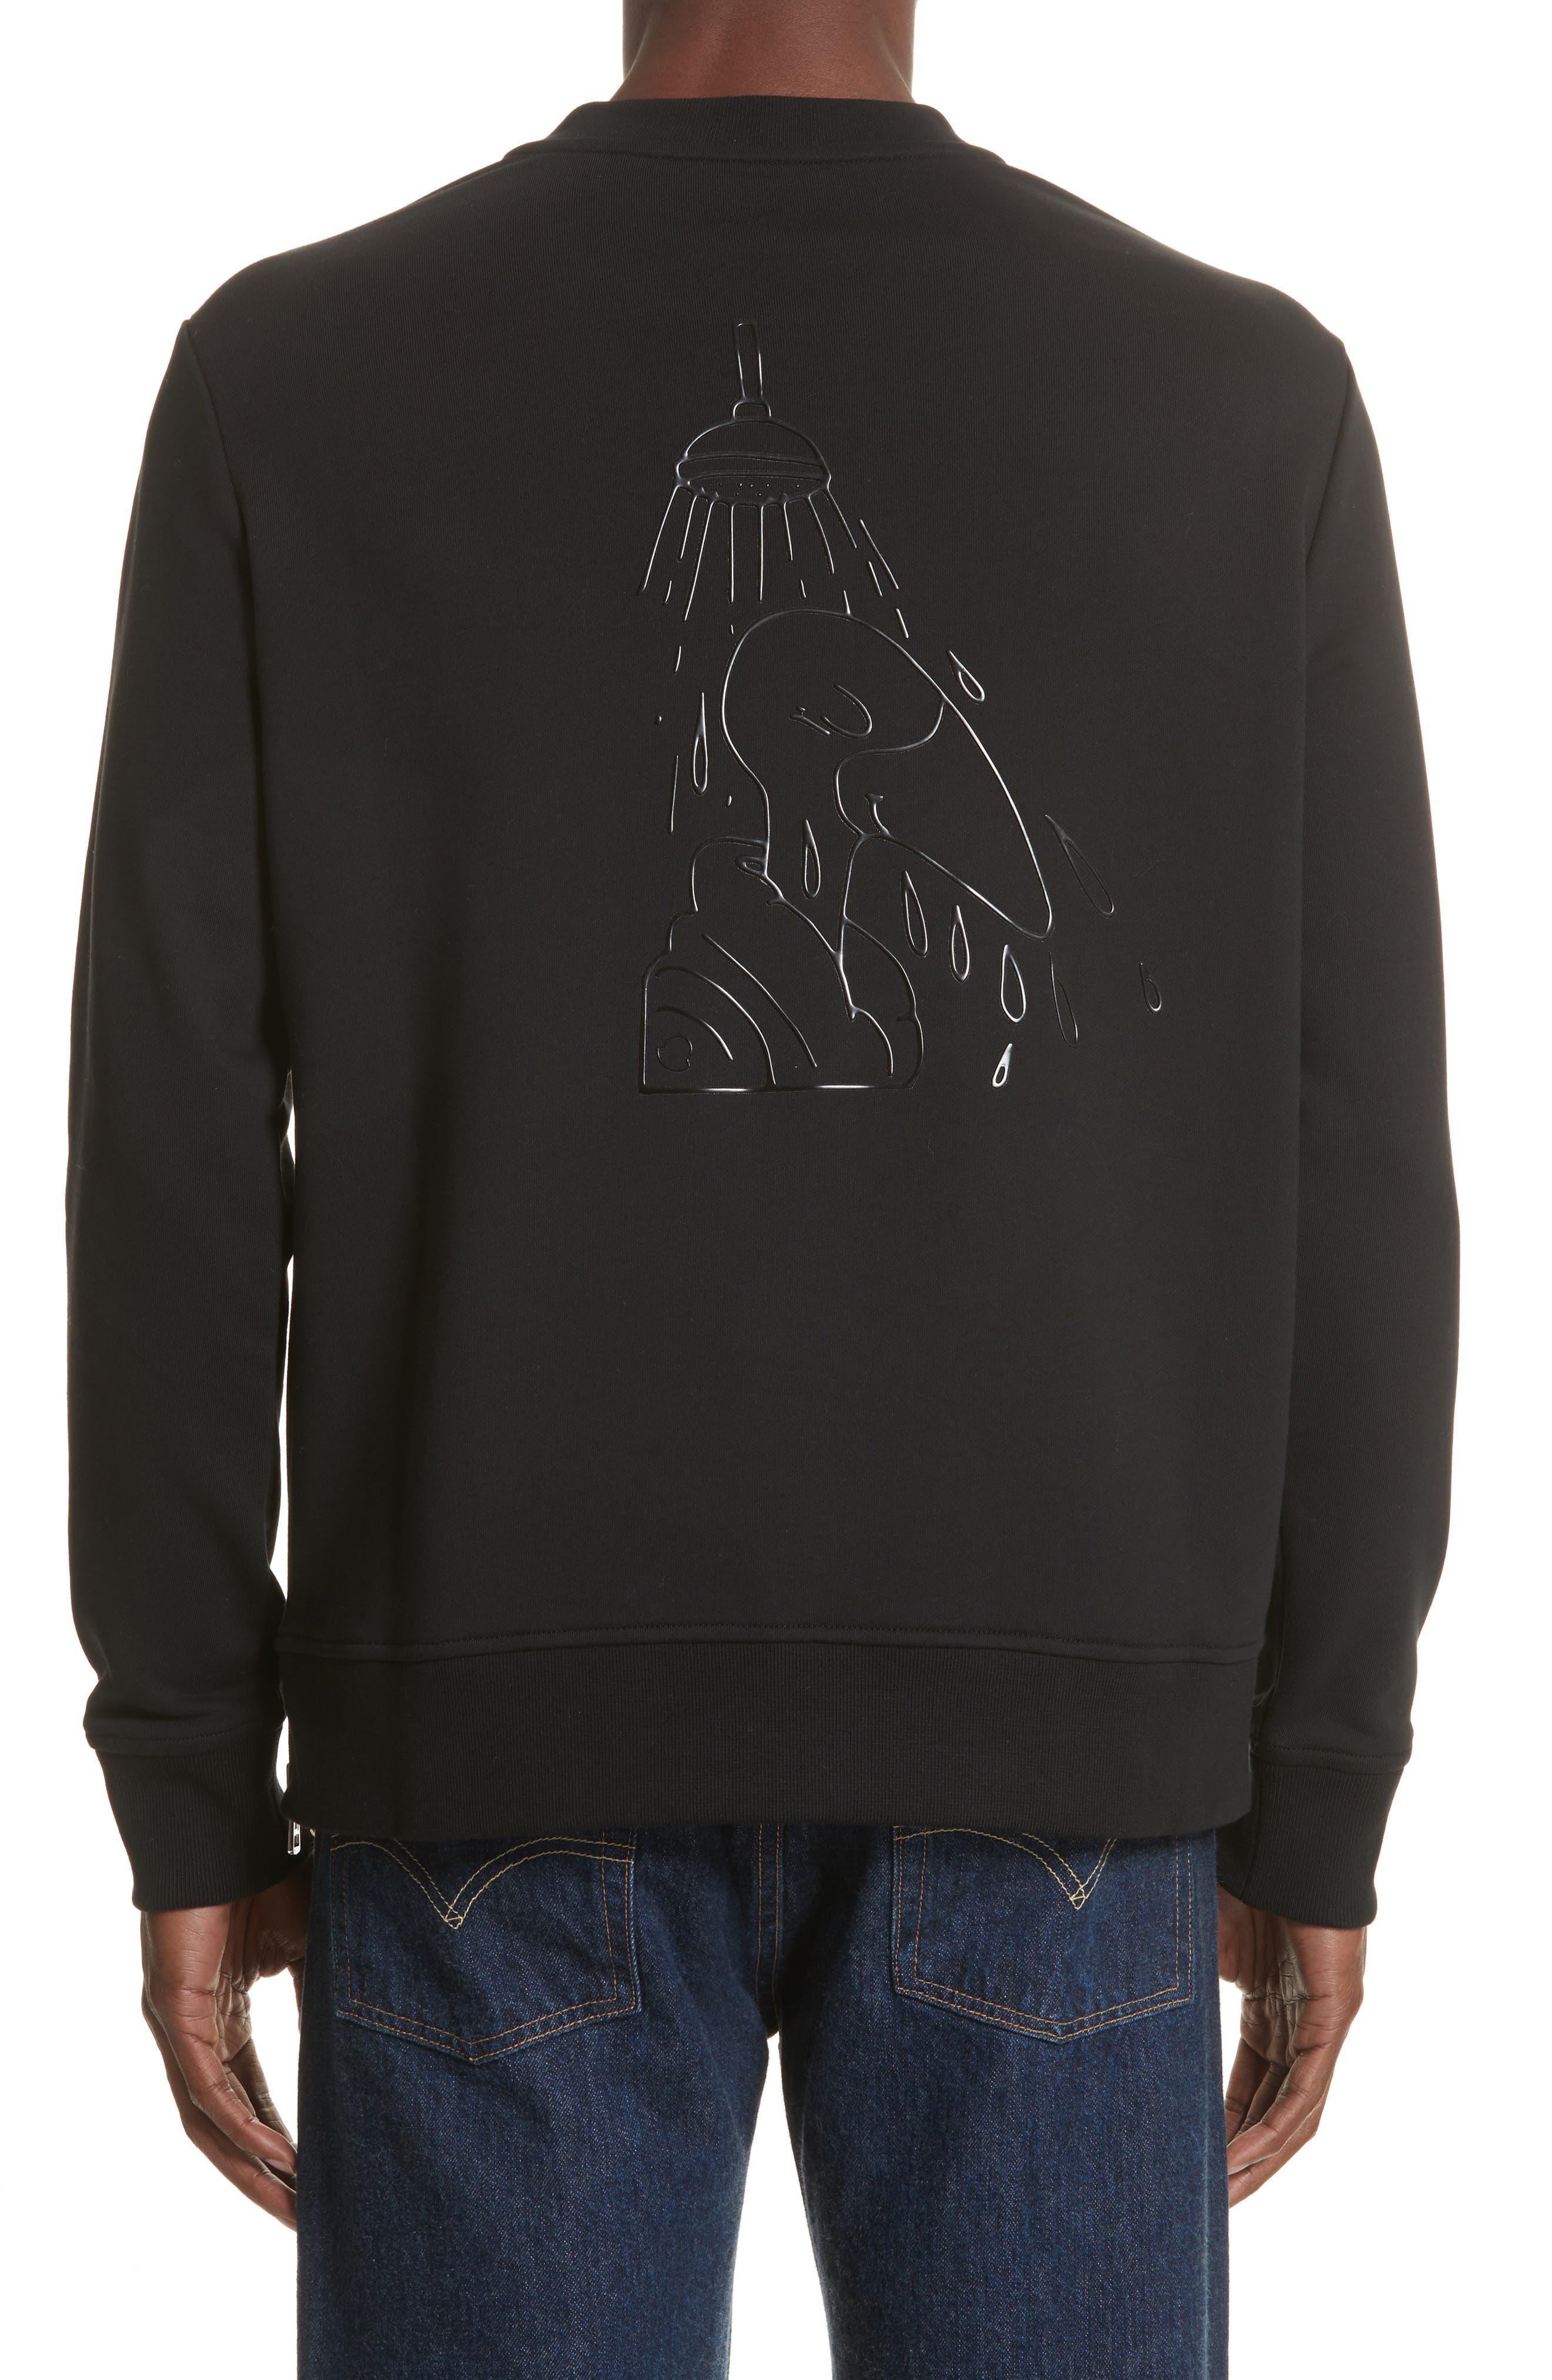 Maglia Griccollo Side Zip Crewneck Sweatshirt,                             Alternate thumbnail 2, color,                             Black